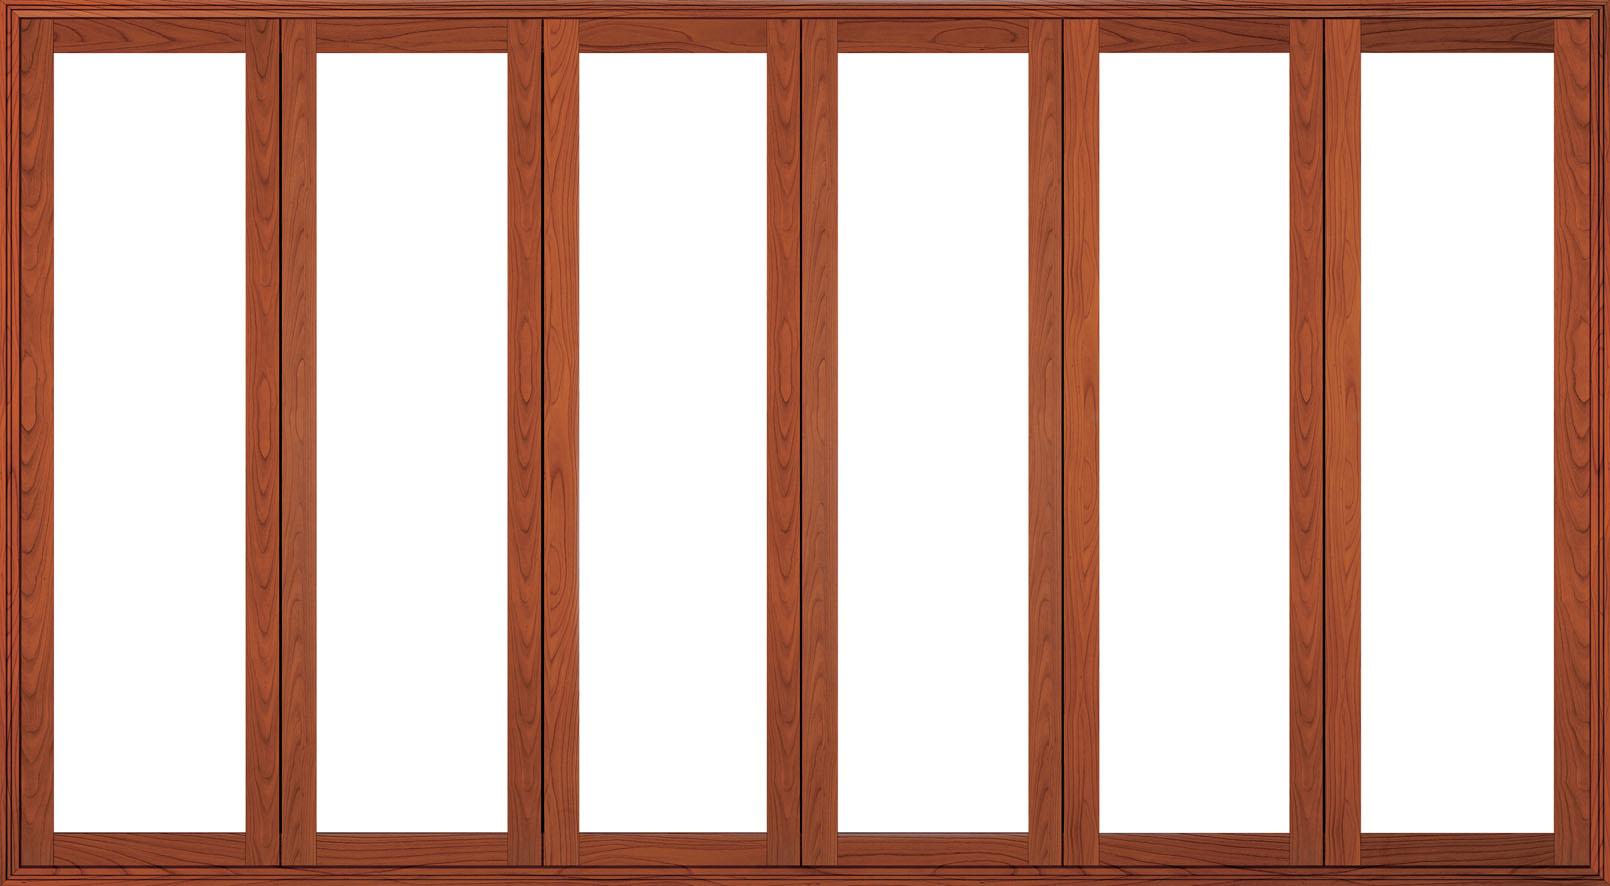 Collection Plastic Folding Shower Doors Pictures - Losro.com